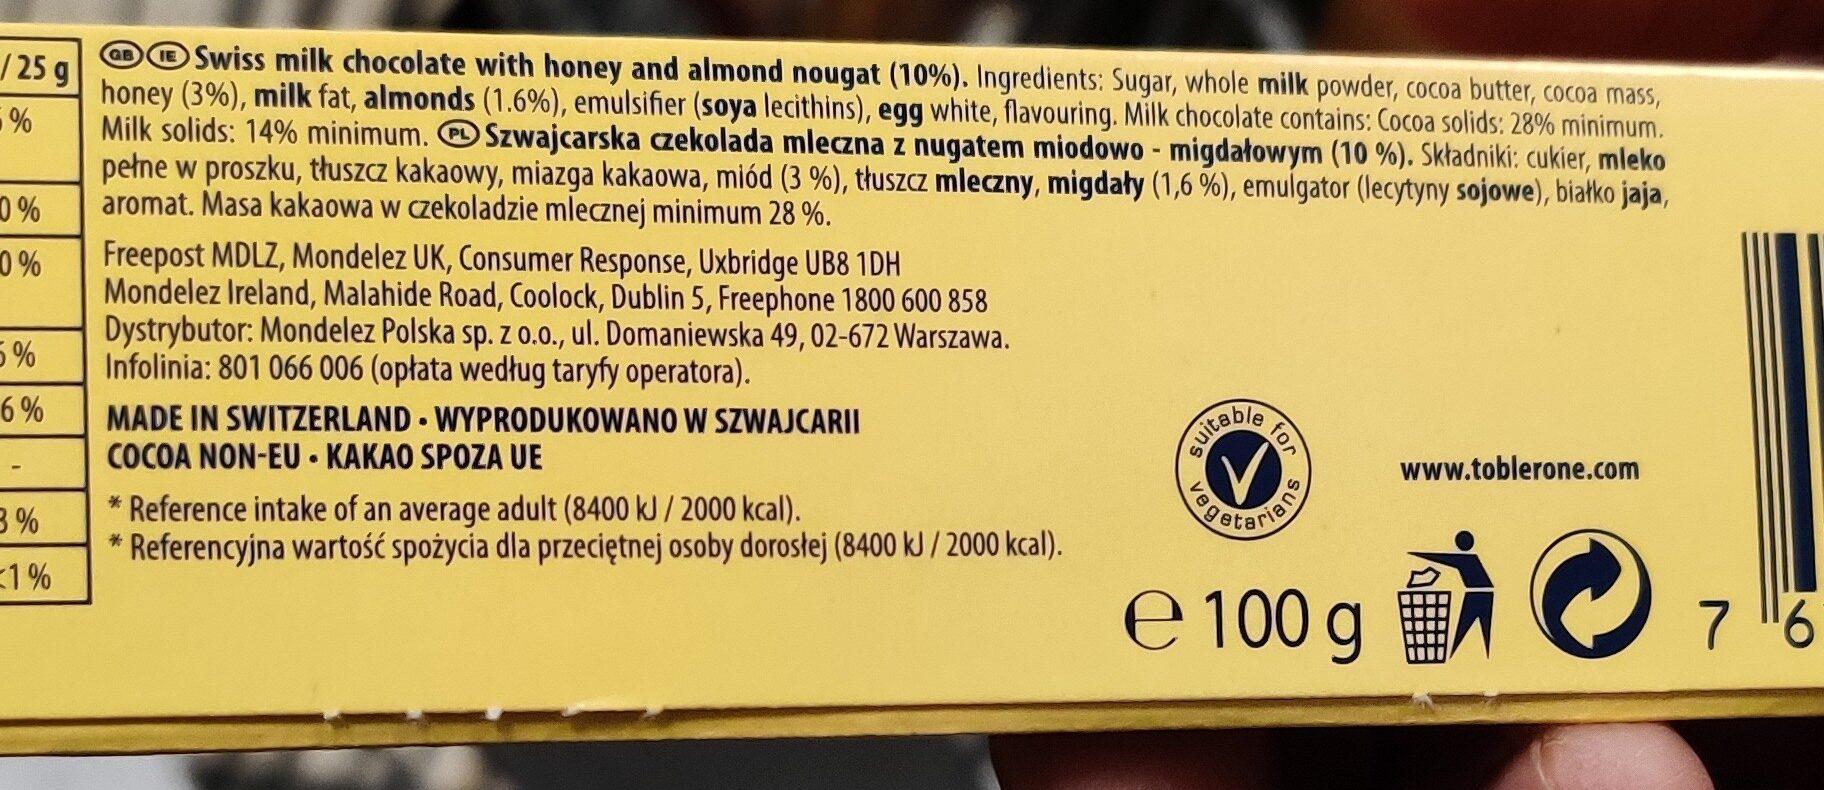 toblerone - Product - en